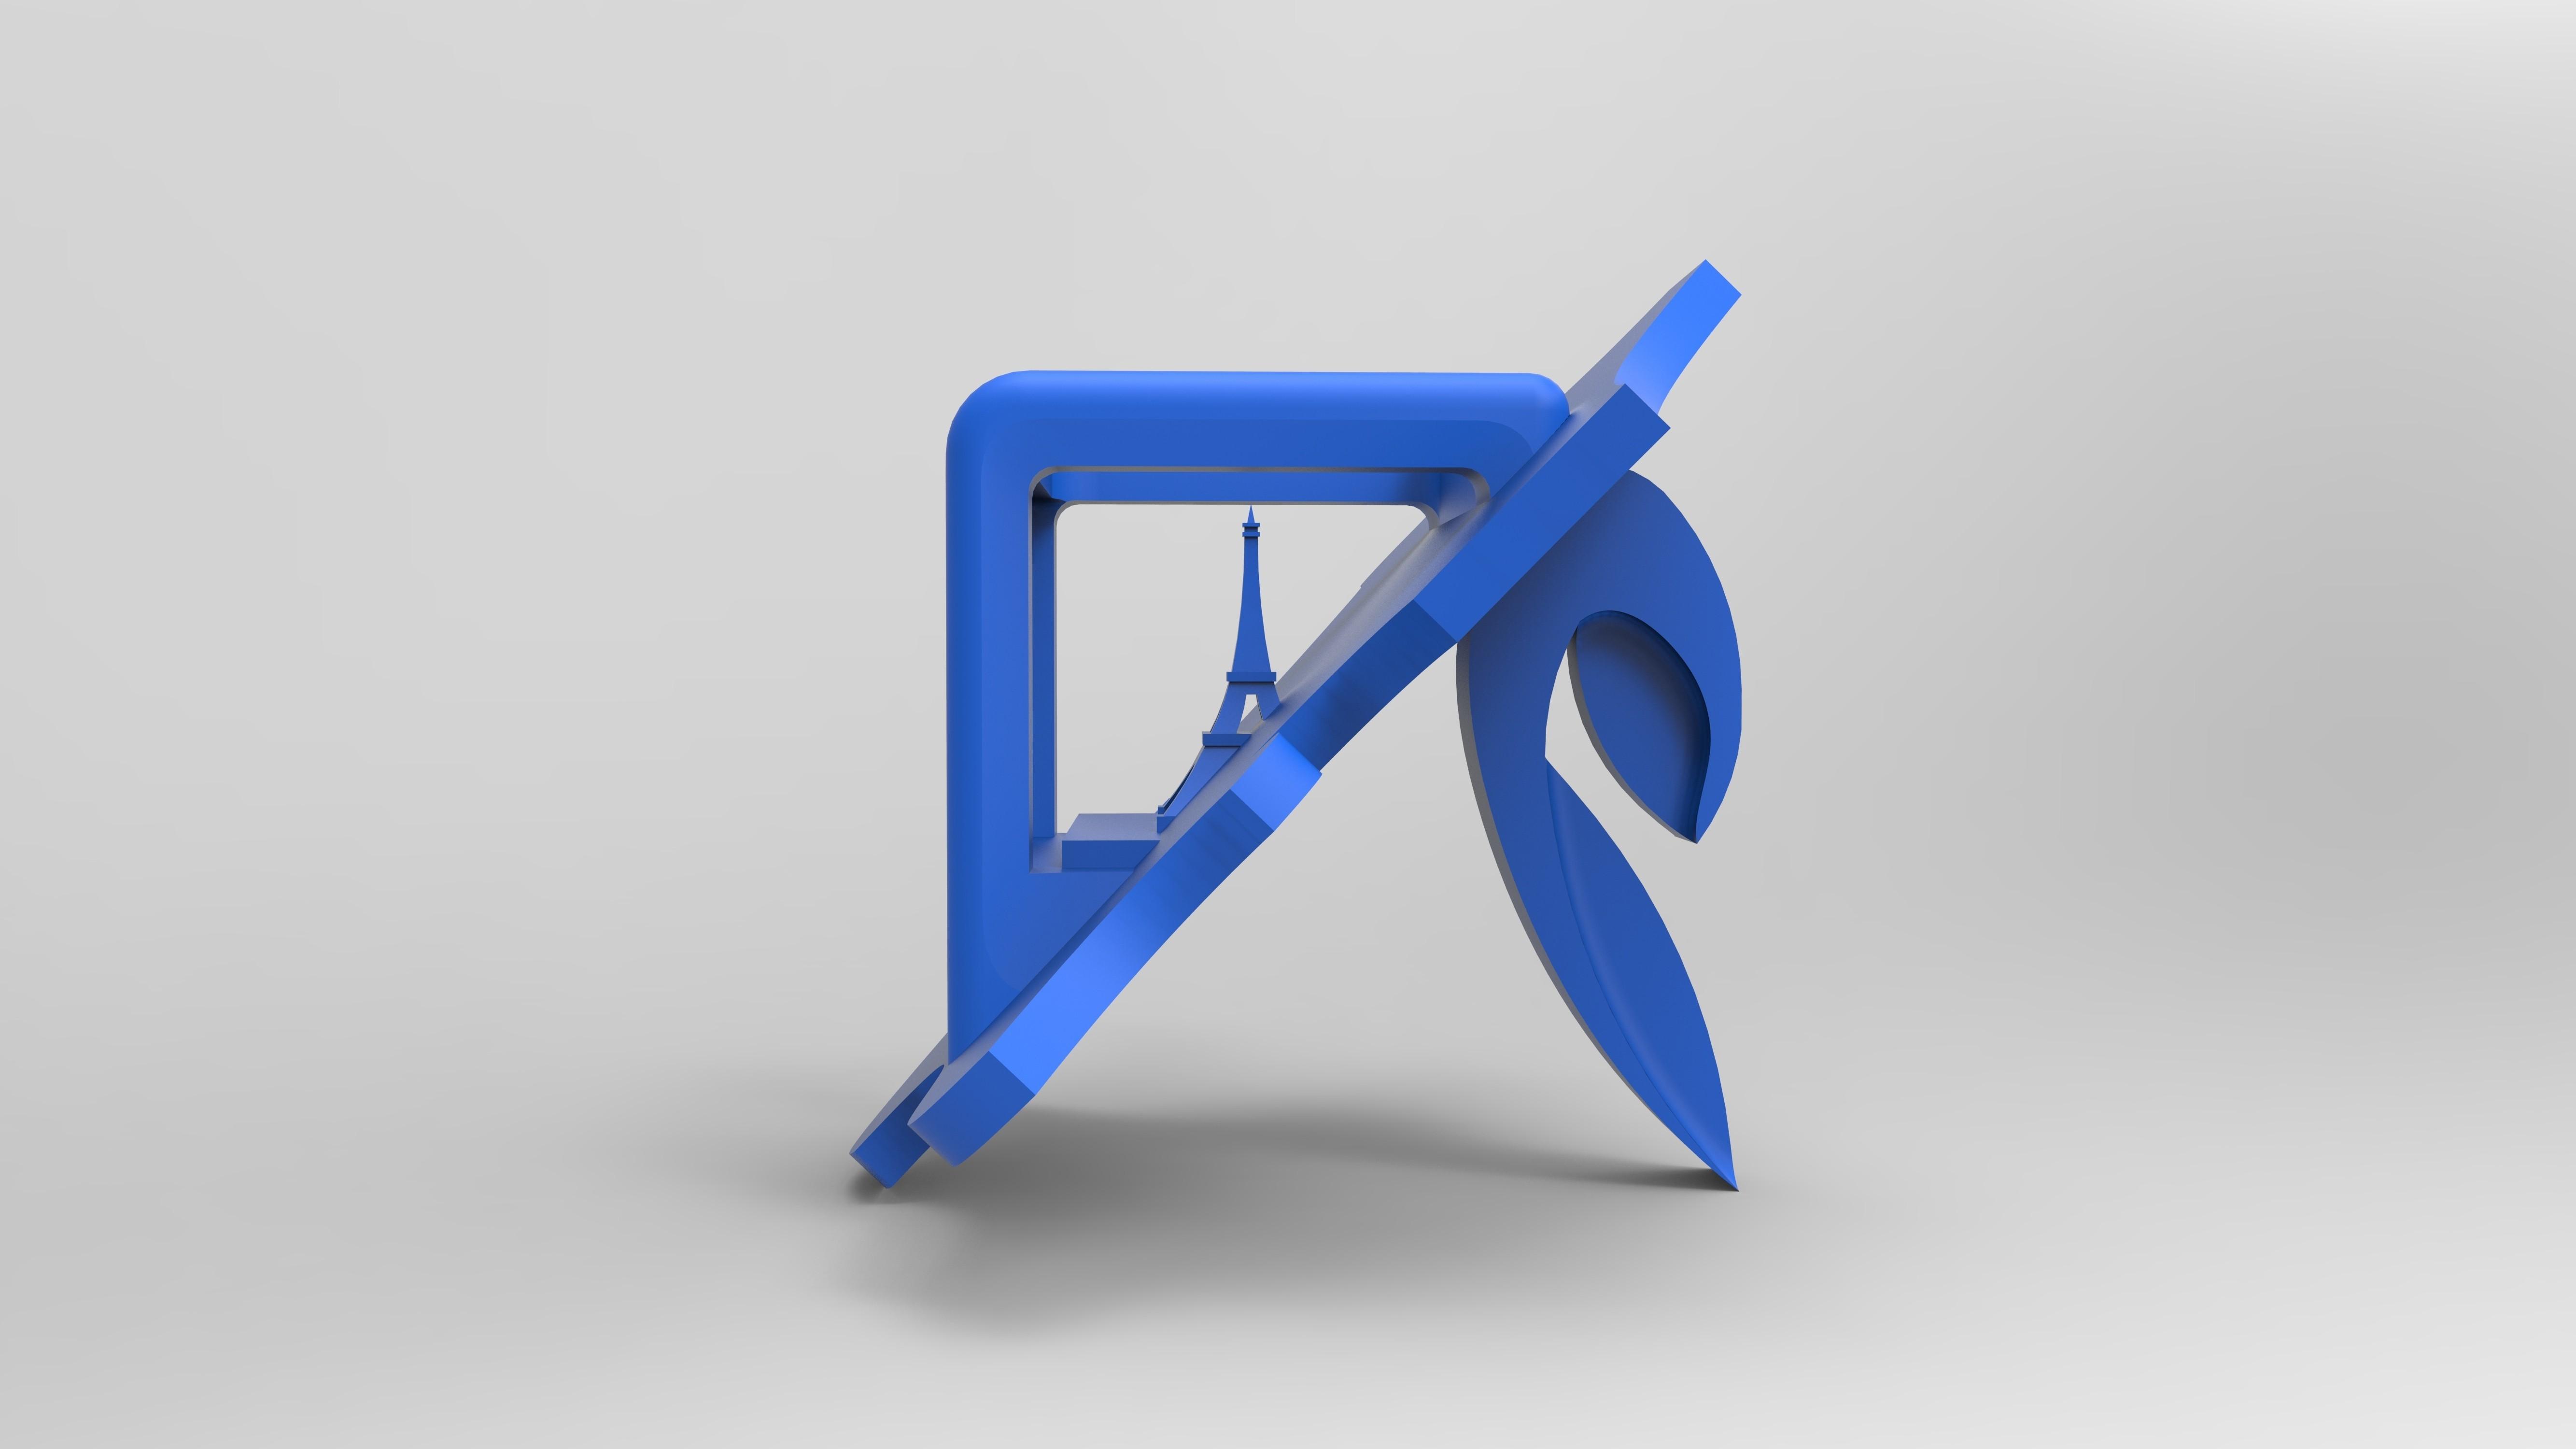 renducie droitebleu.197.jpg Download free STL file Key ring or stratomaker figurine - printer located in France • 3D printer template, GuilhemPerroud